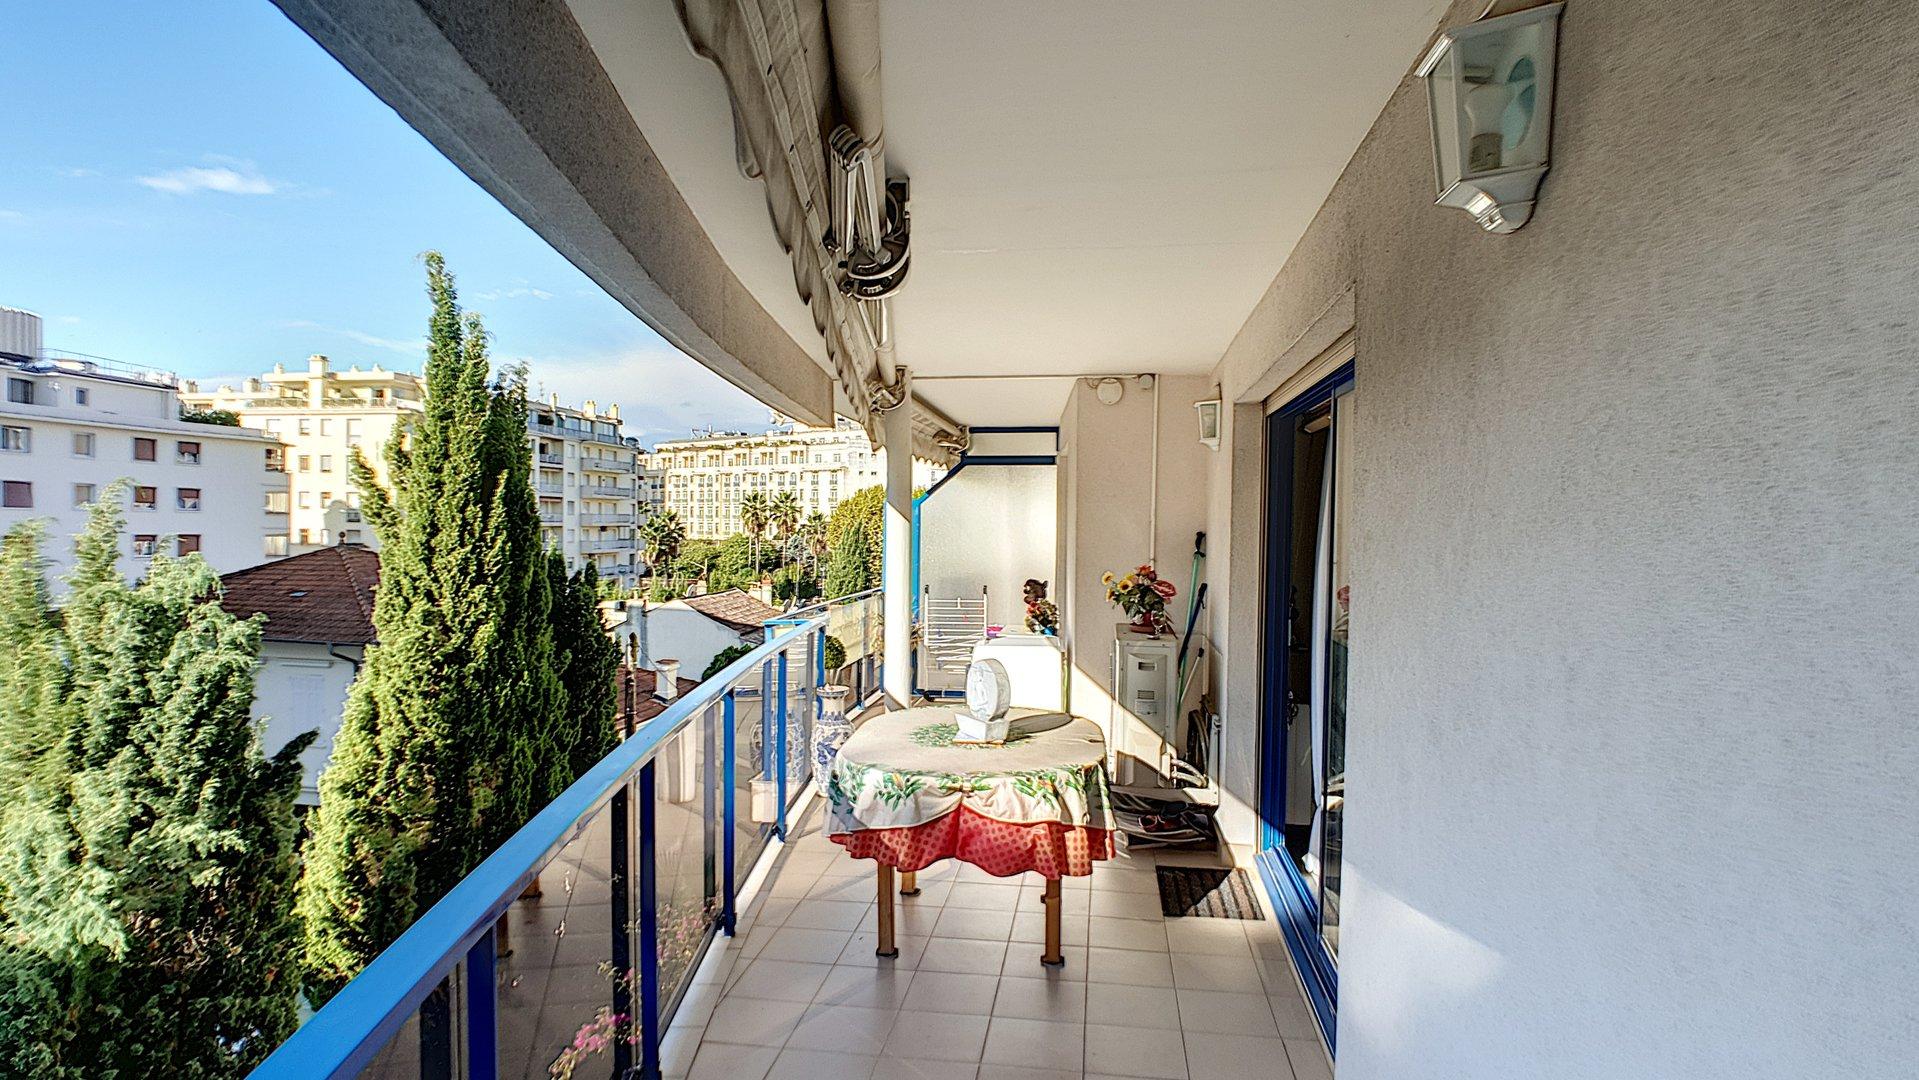 Fantastisk lägenhet till salu i Cannes Basse Californie